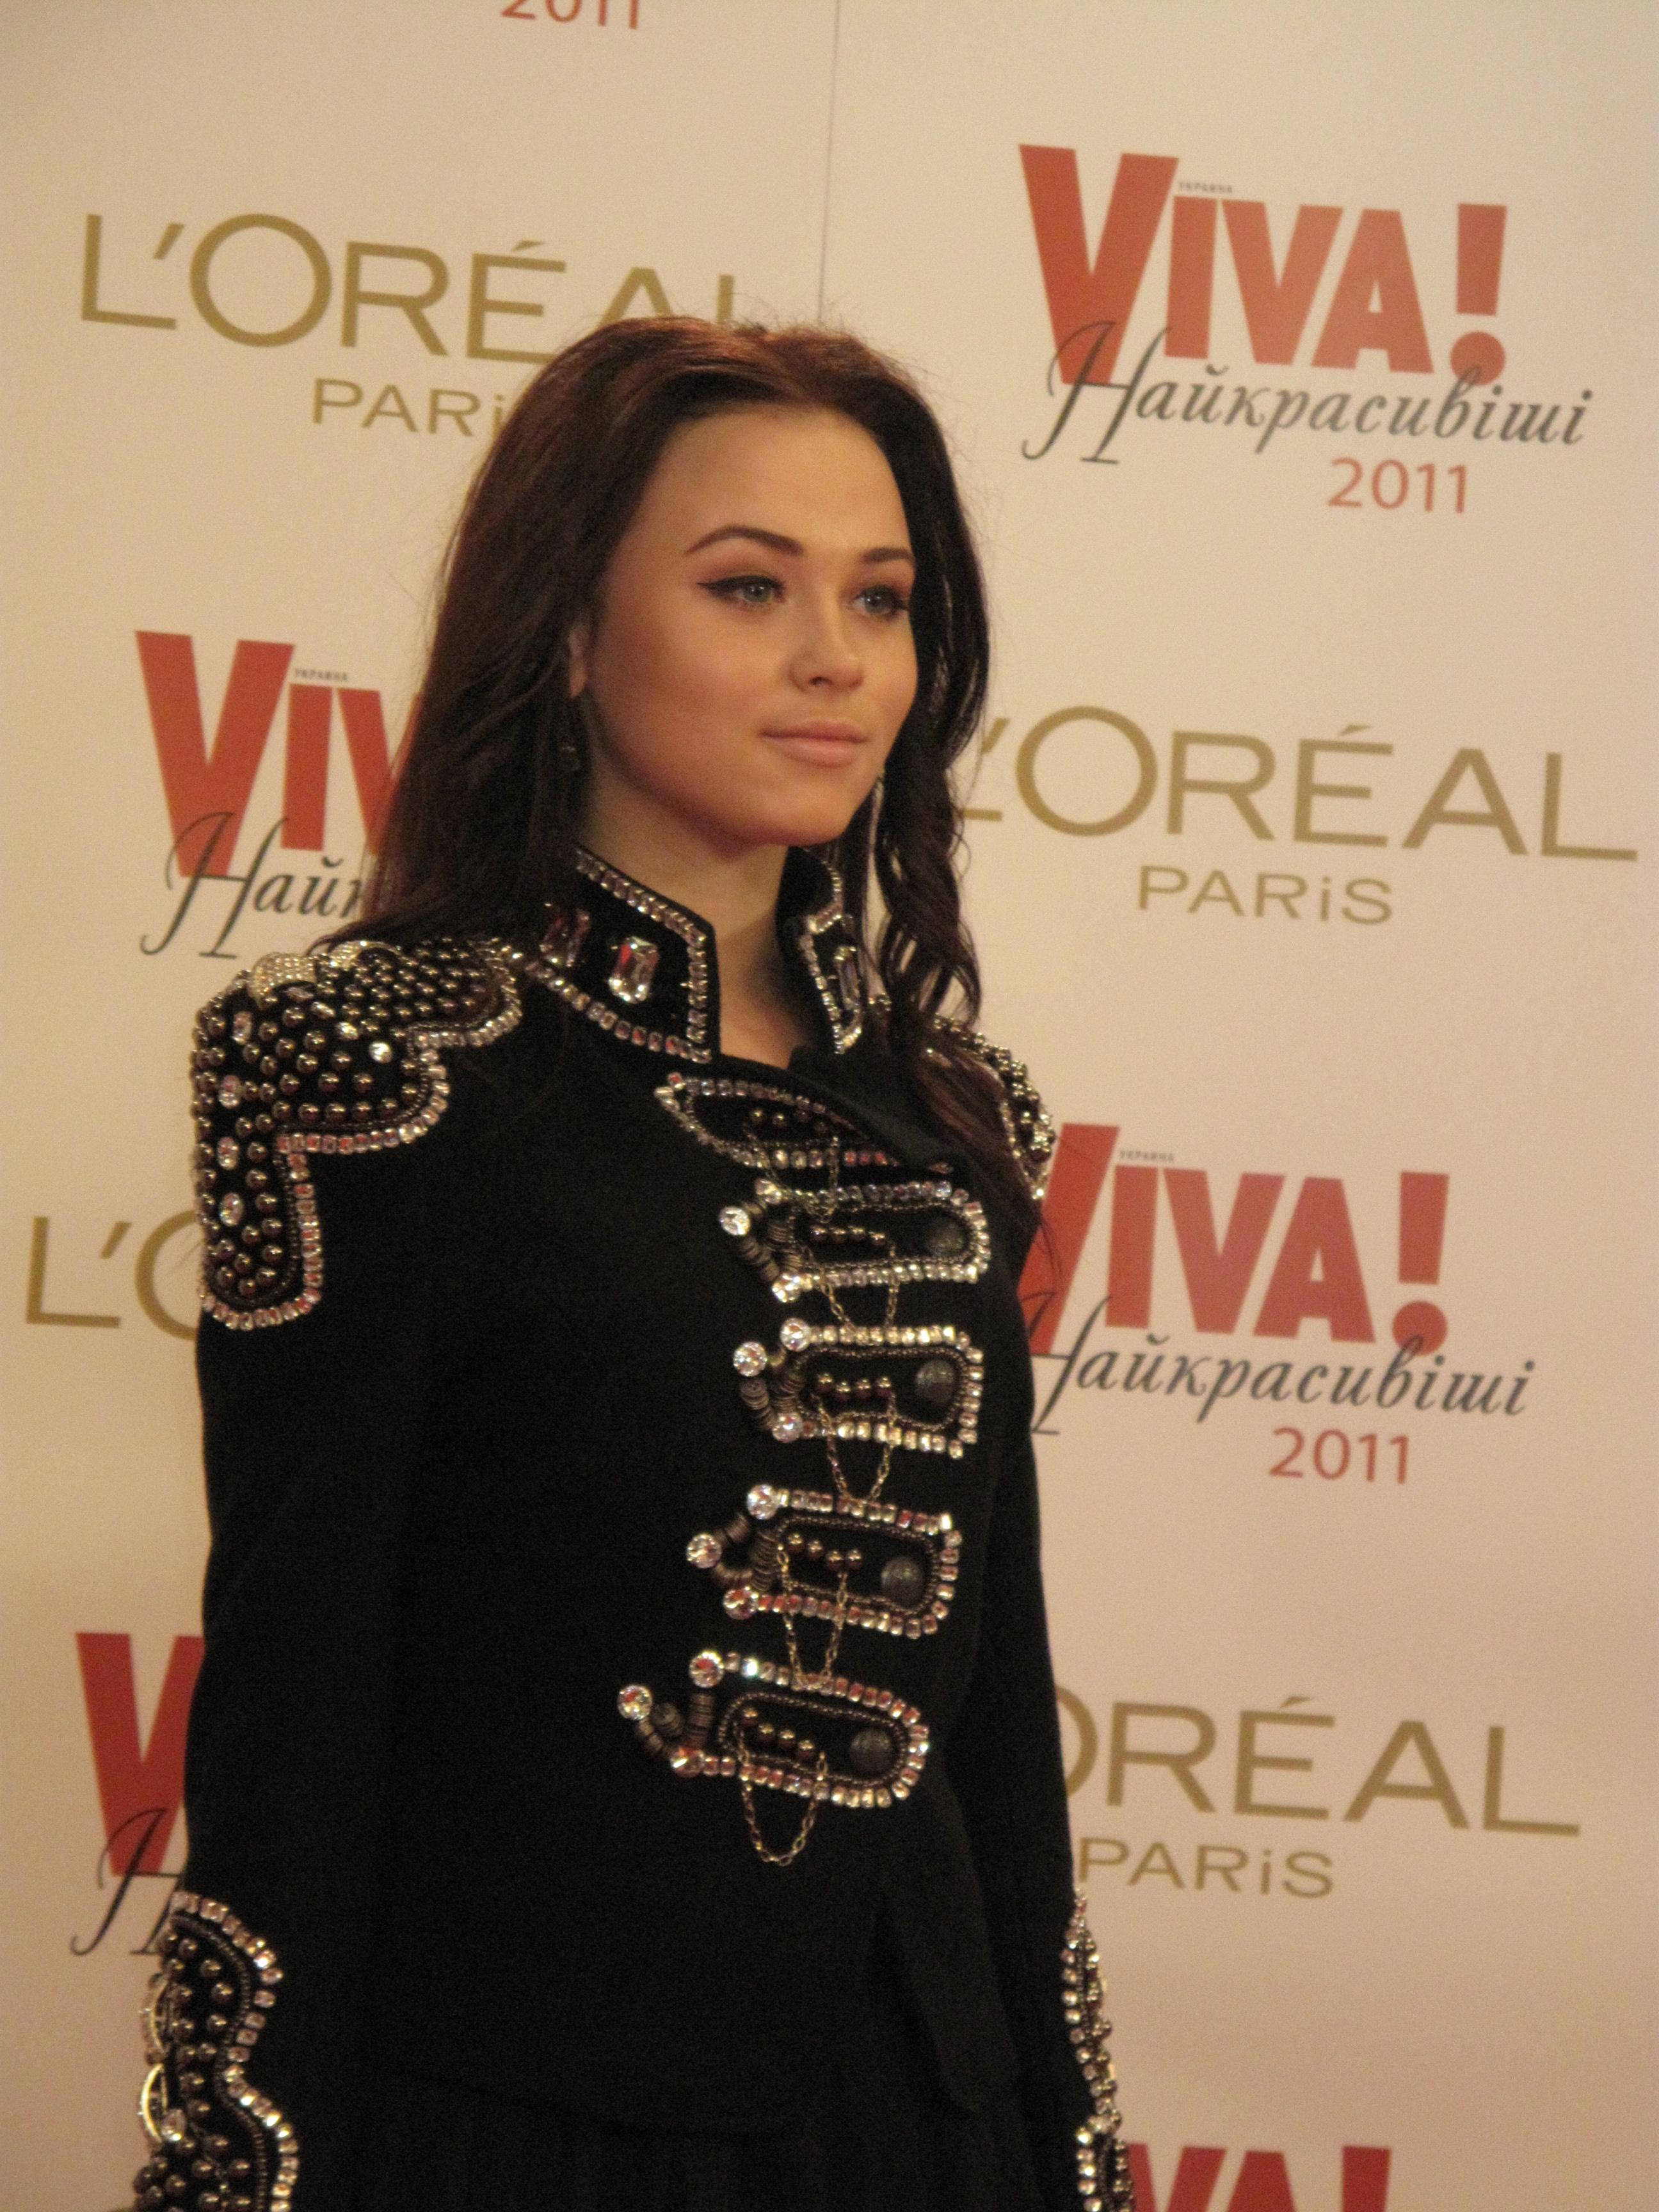 Viva! Самые красивые 2011. Фото: Елена Балакина/The Epoch Times Украина